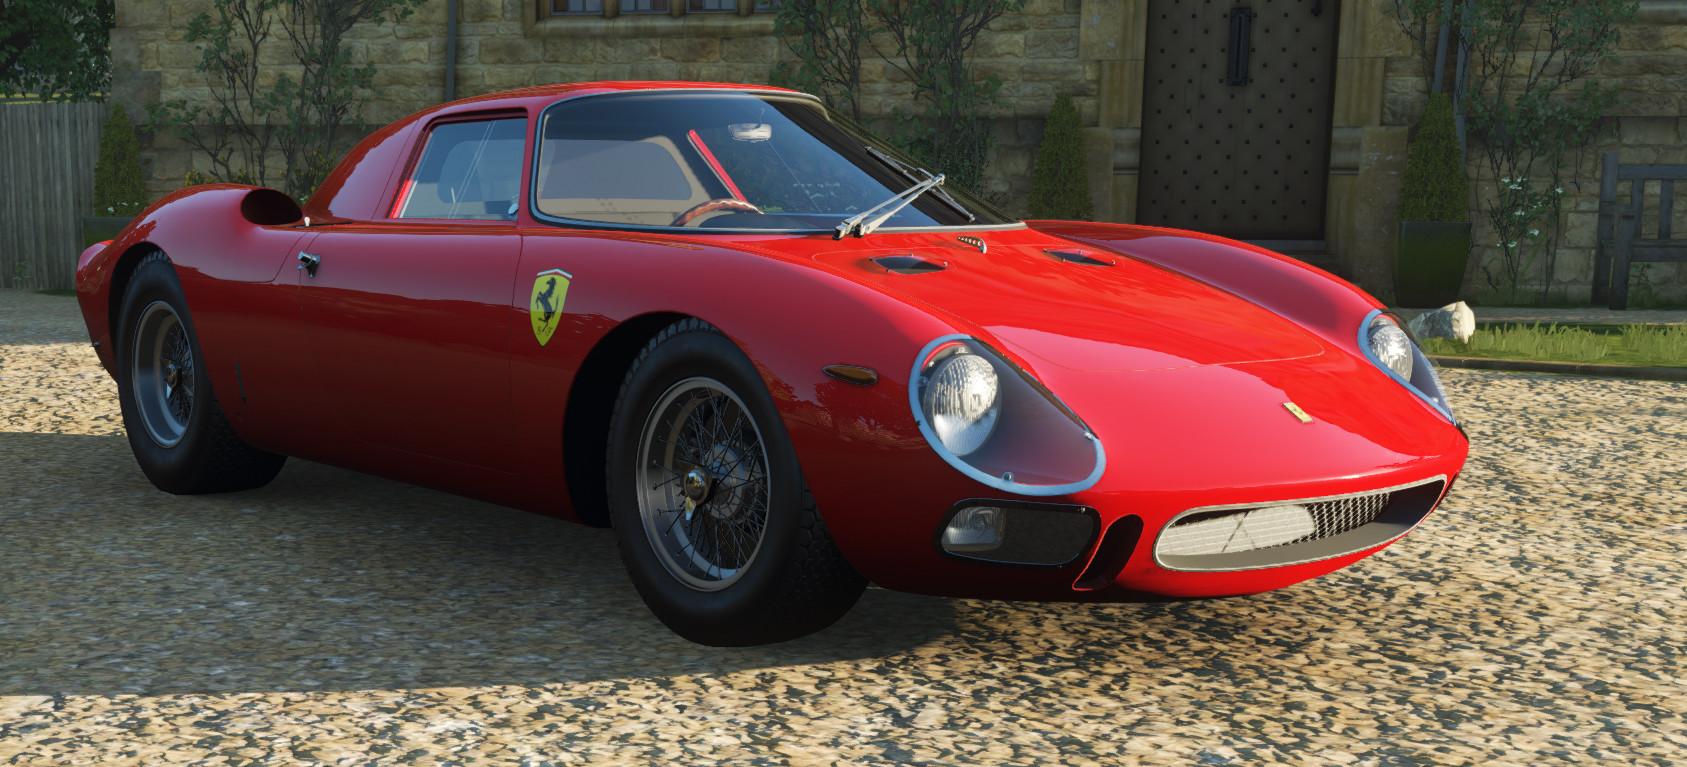 screenshot of the Ferrari 250LM